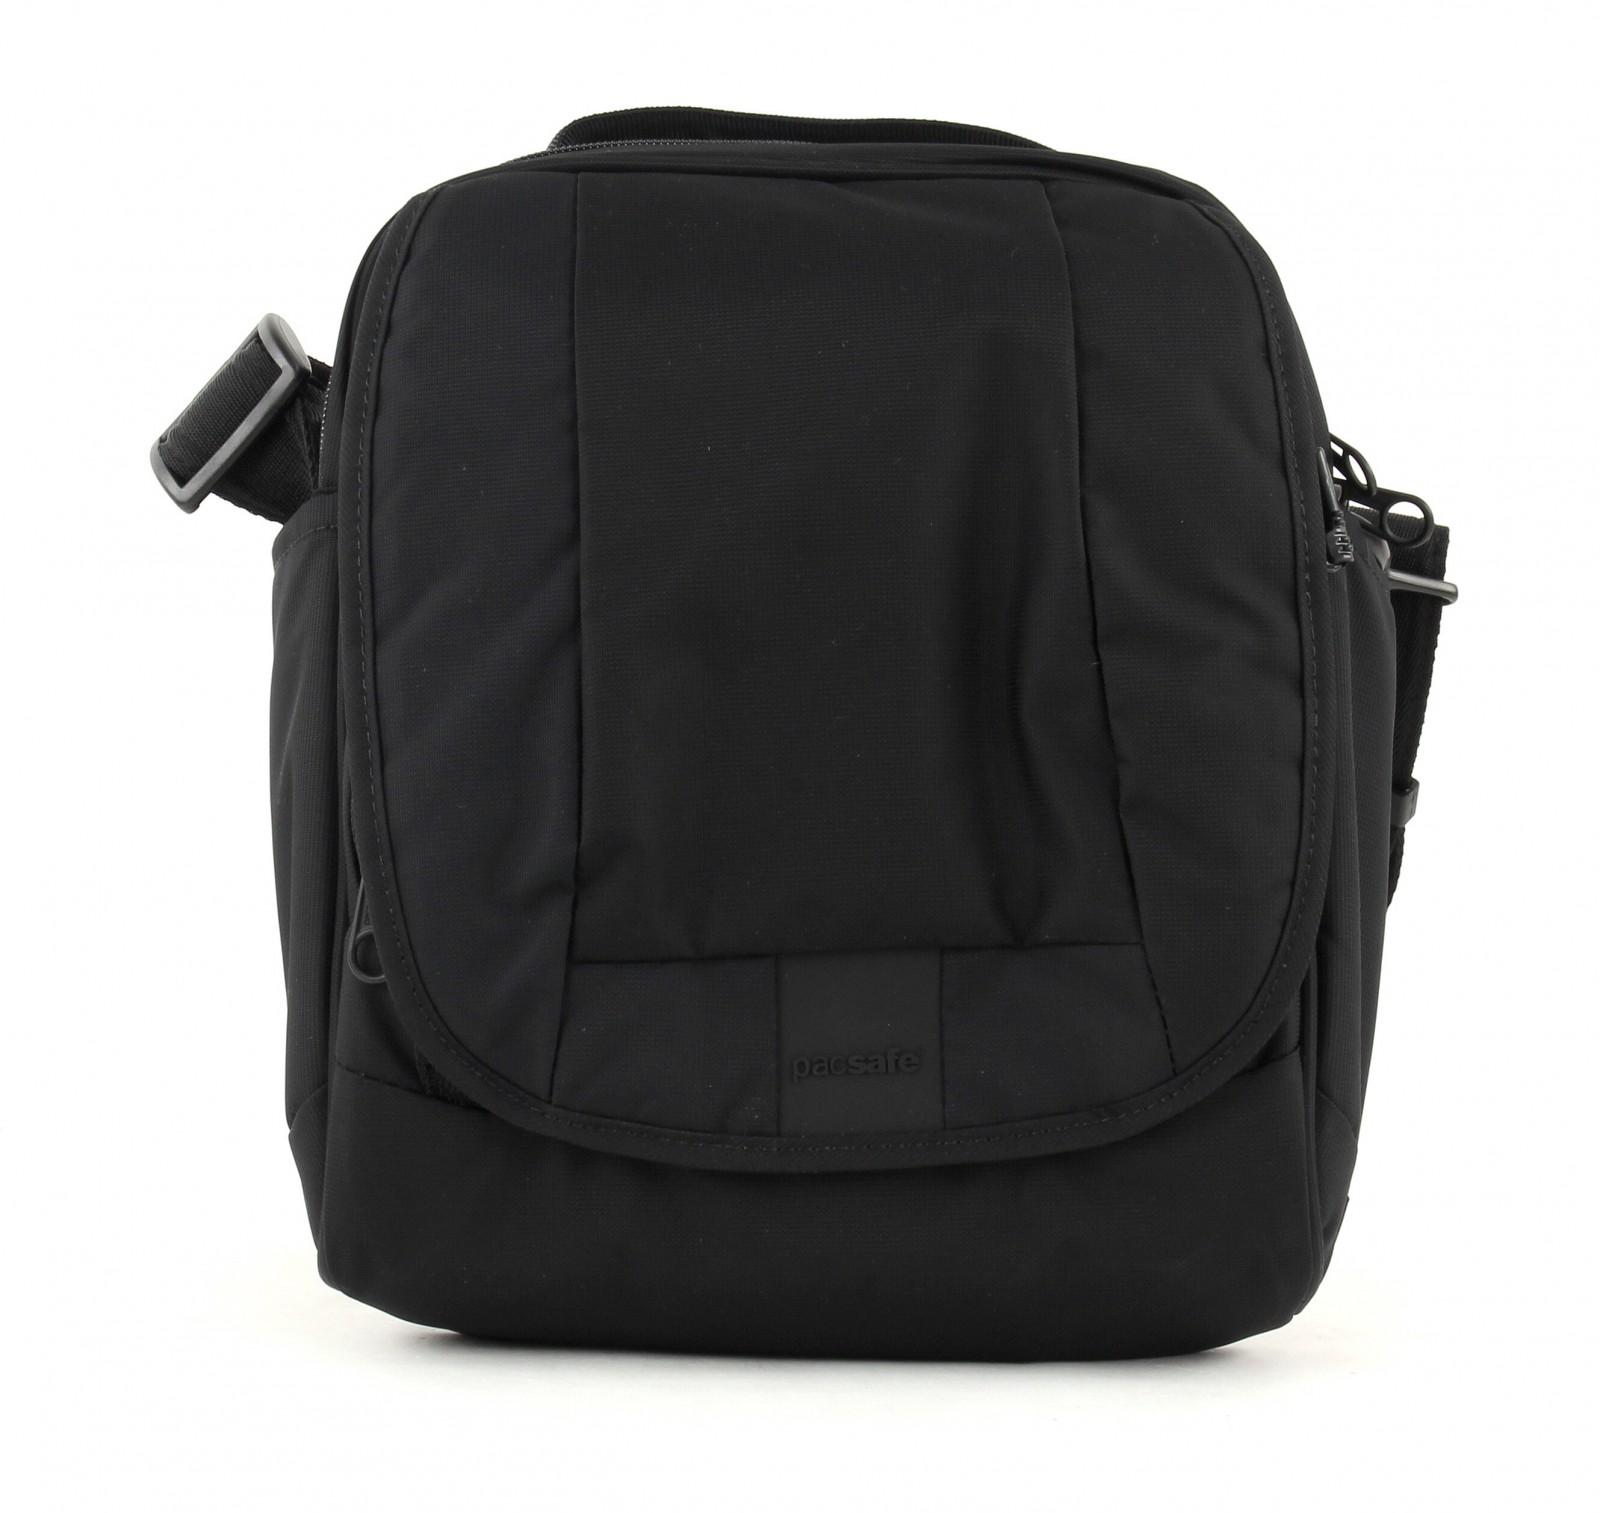 pacsafe Metrosafe LS200 Anti-Theft Shoulder Bag Black